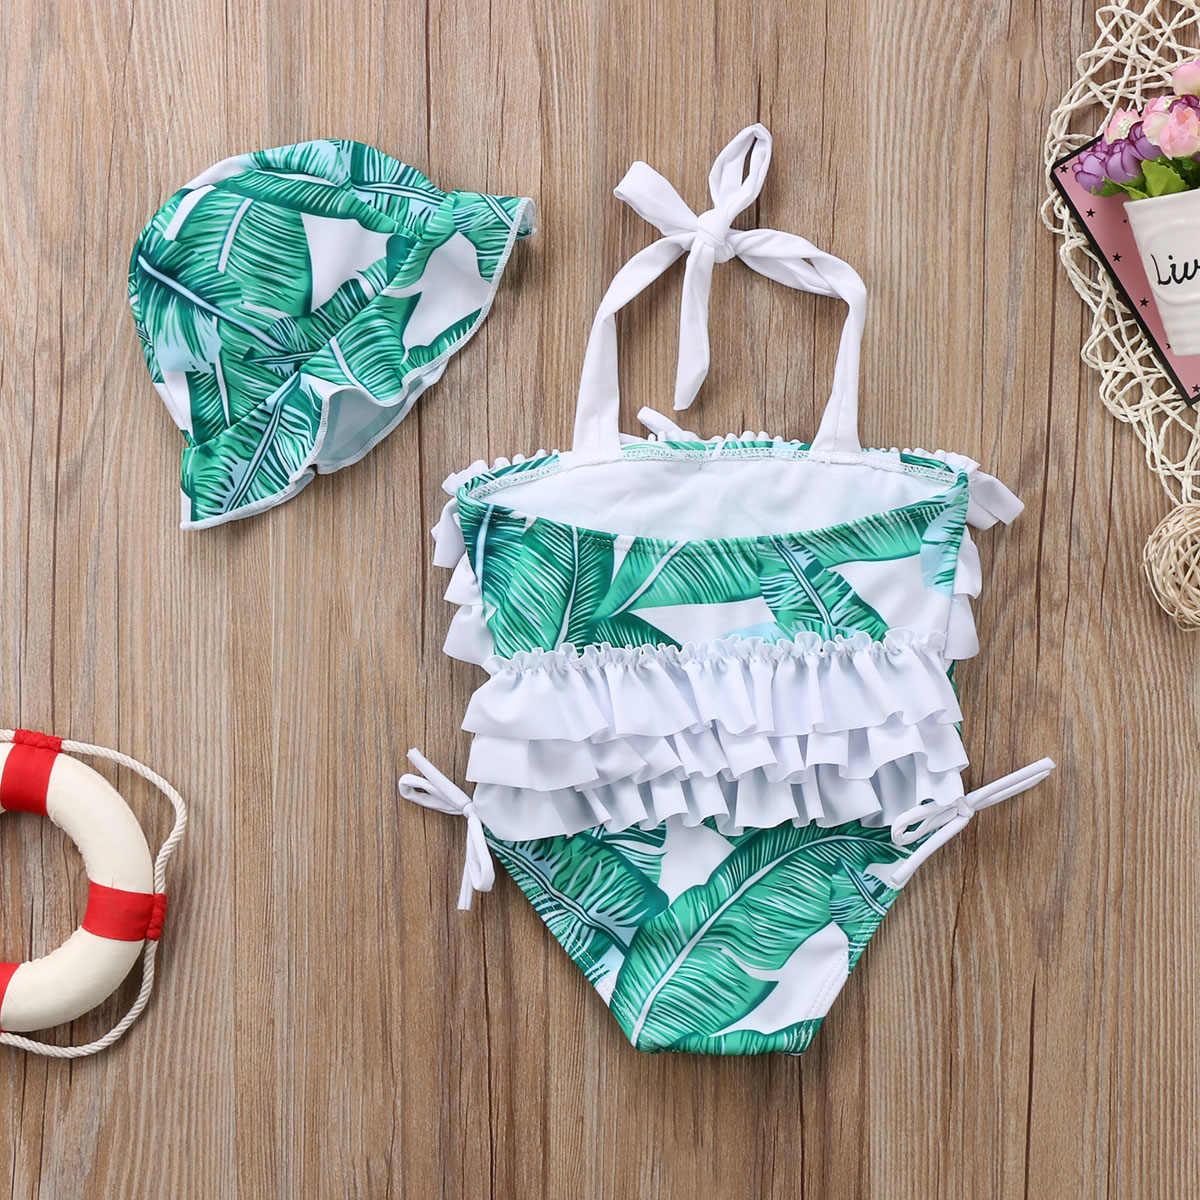 Niños bebé niña Bañador con estampado de palmeras traje de baño Tankini Bikini One pieces sombrero 2018 verano nuevo Bikini de niña con volantes